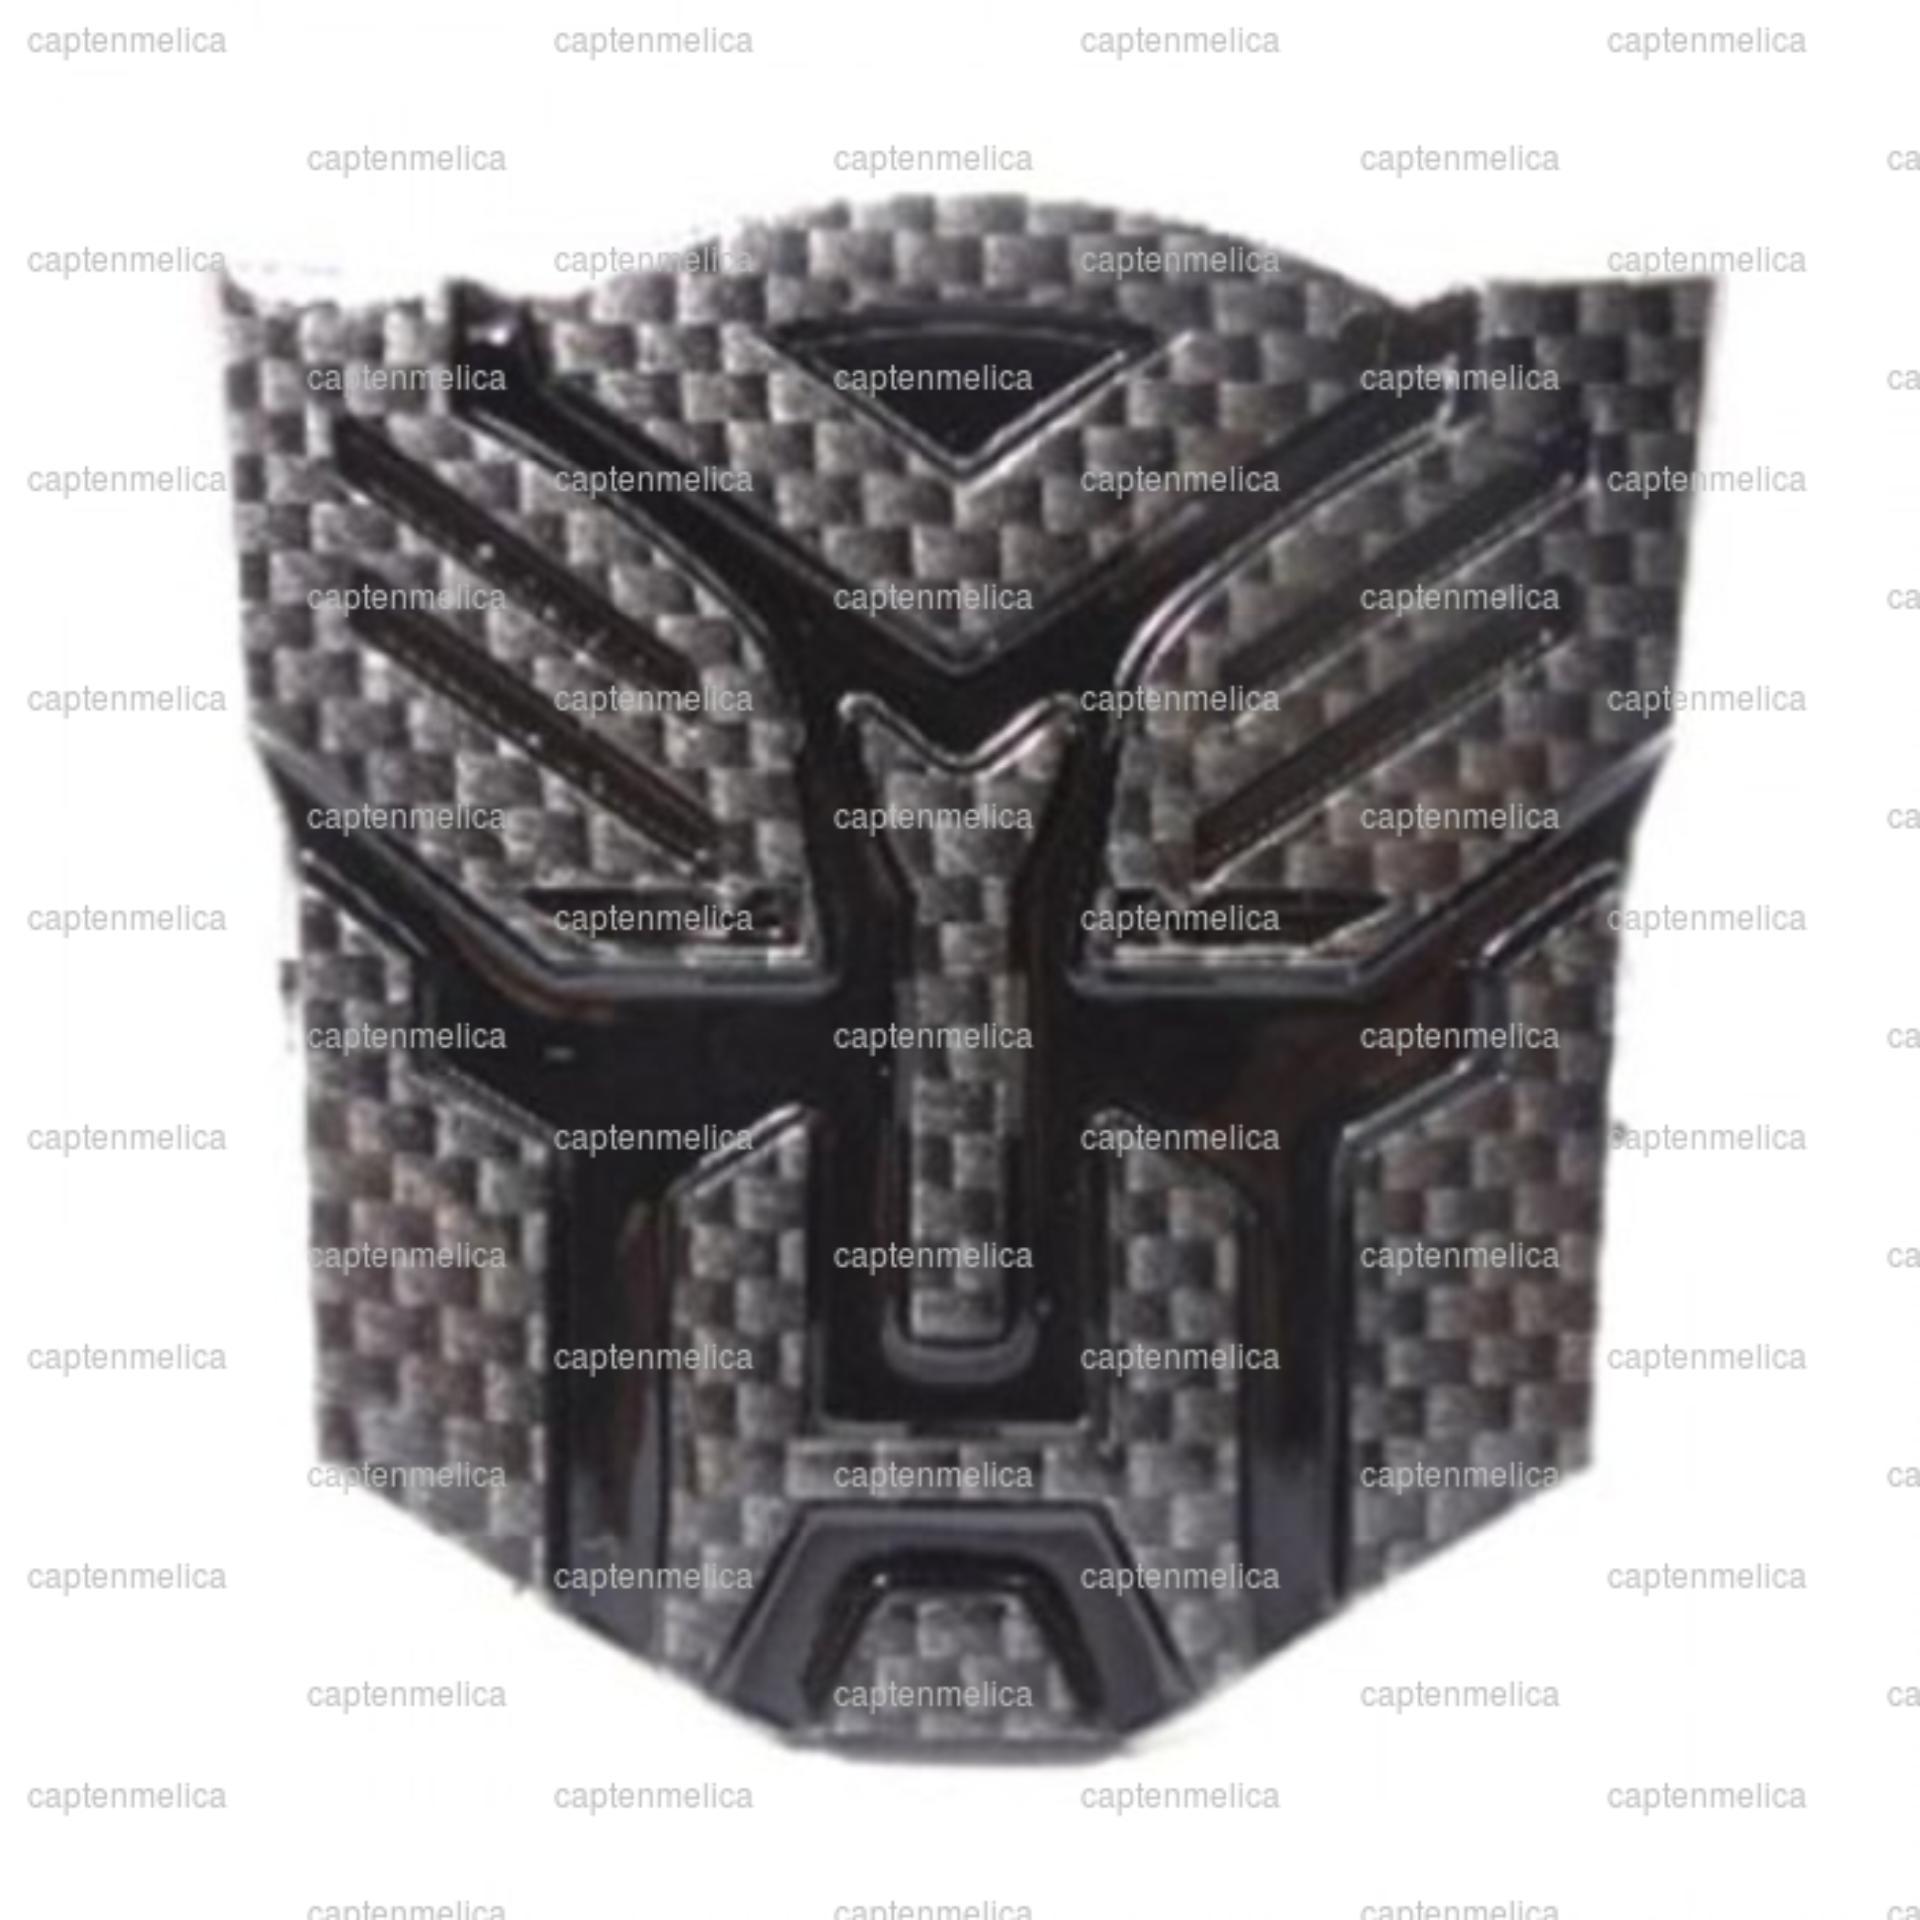 Beli Murah Harga Diskon Emblem Transformer Autobots Karbon Hitam Body Cover Sarung Mobil Avanza Xenia Logo Bodi Motor Metal Sticker Stiker Tempel Toyota New